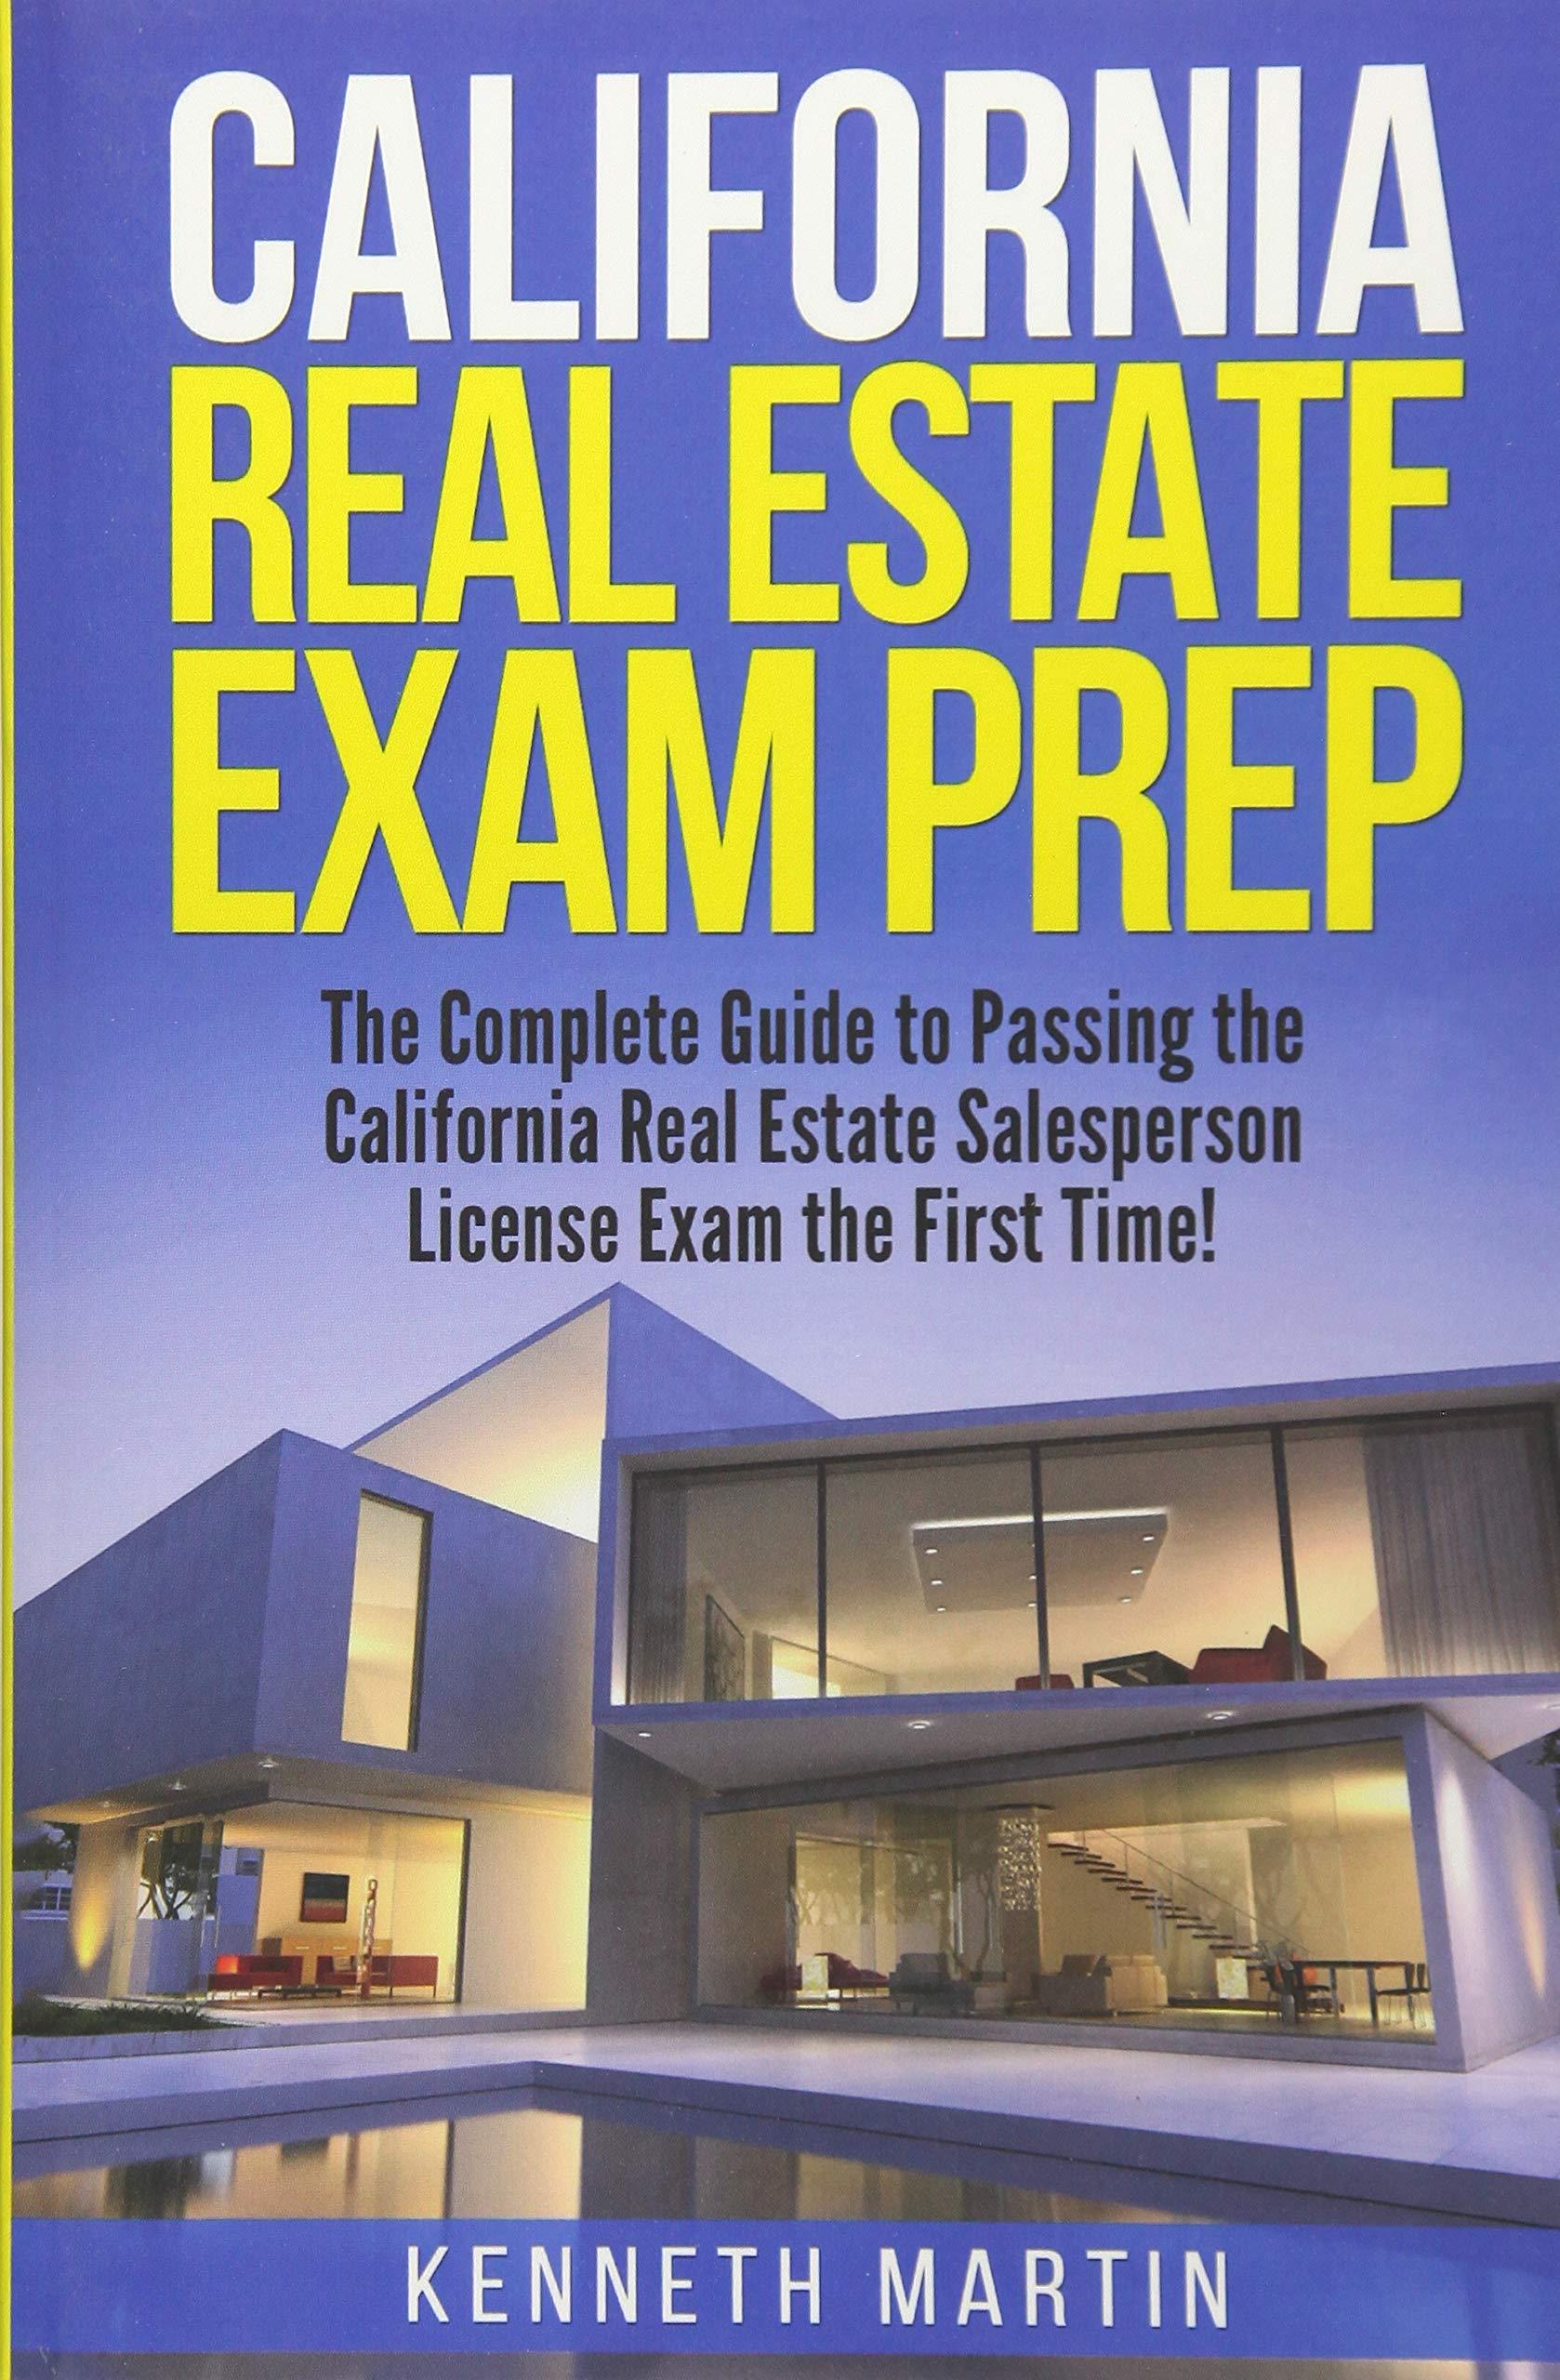 amazon california real estate exam prep the complete guide to